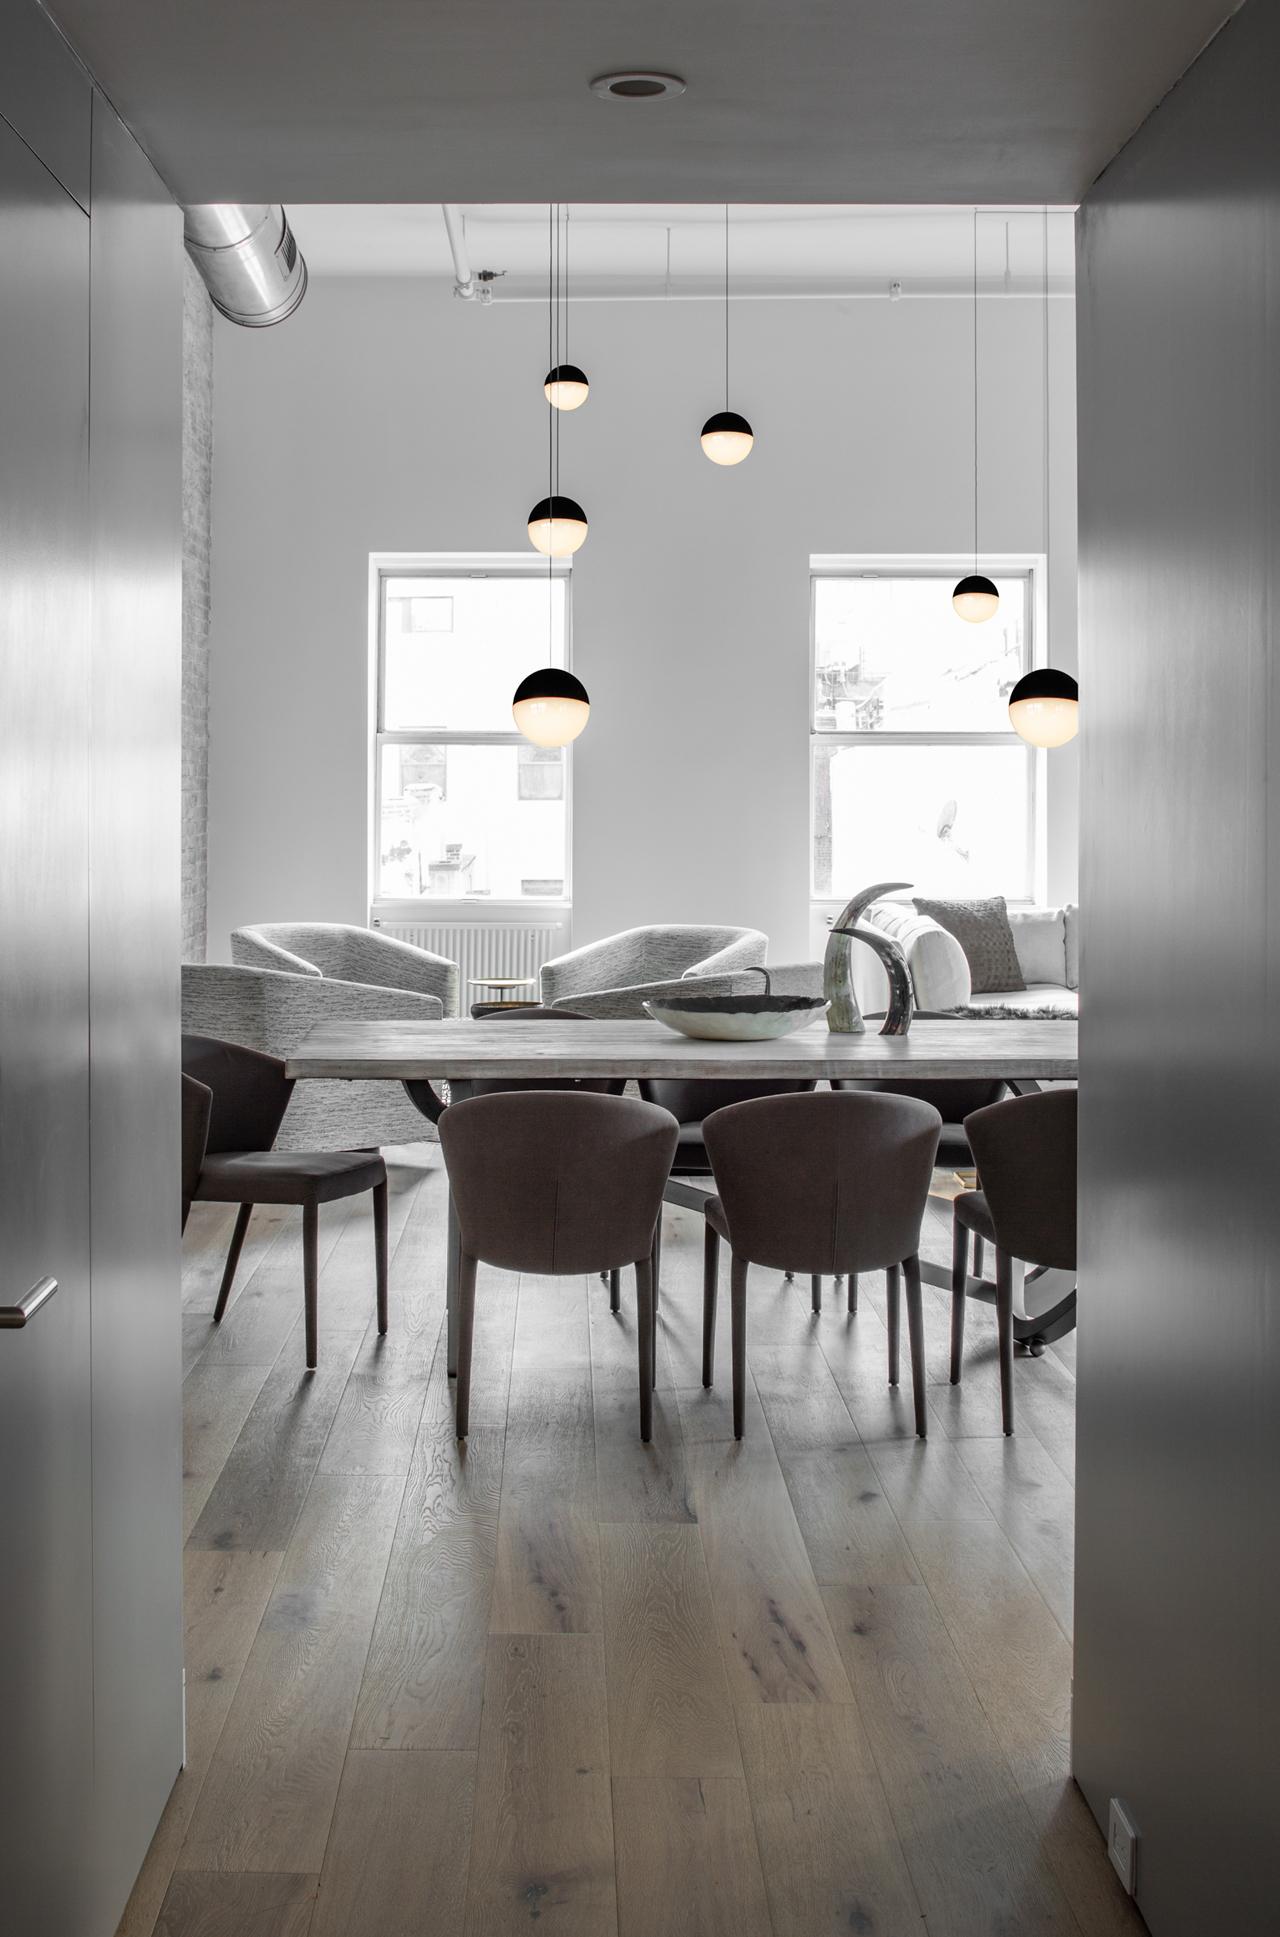 Industrial loft in new york designed for entertaining - Loft industrial ...